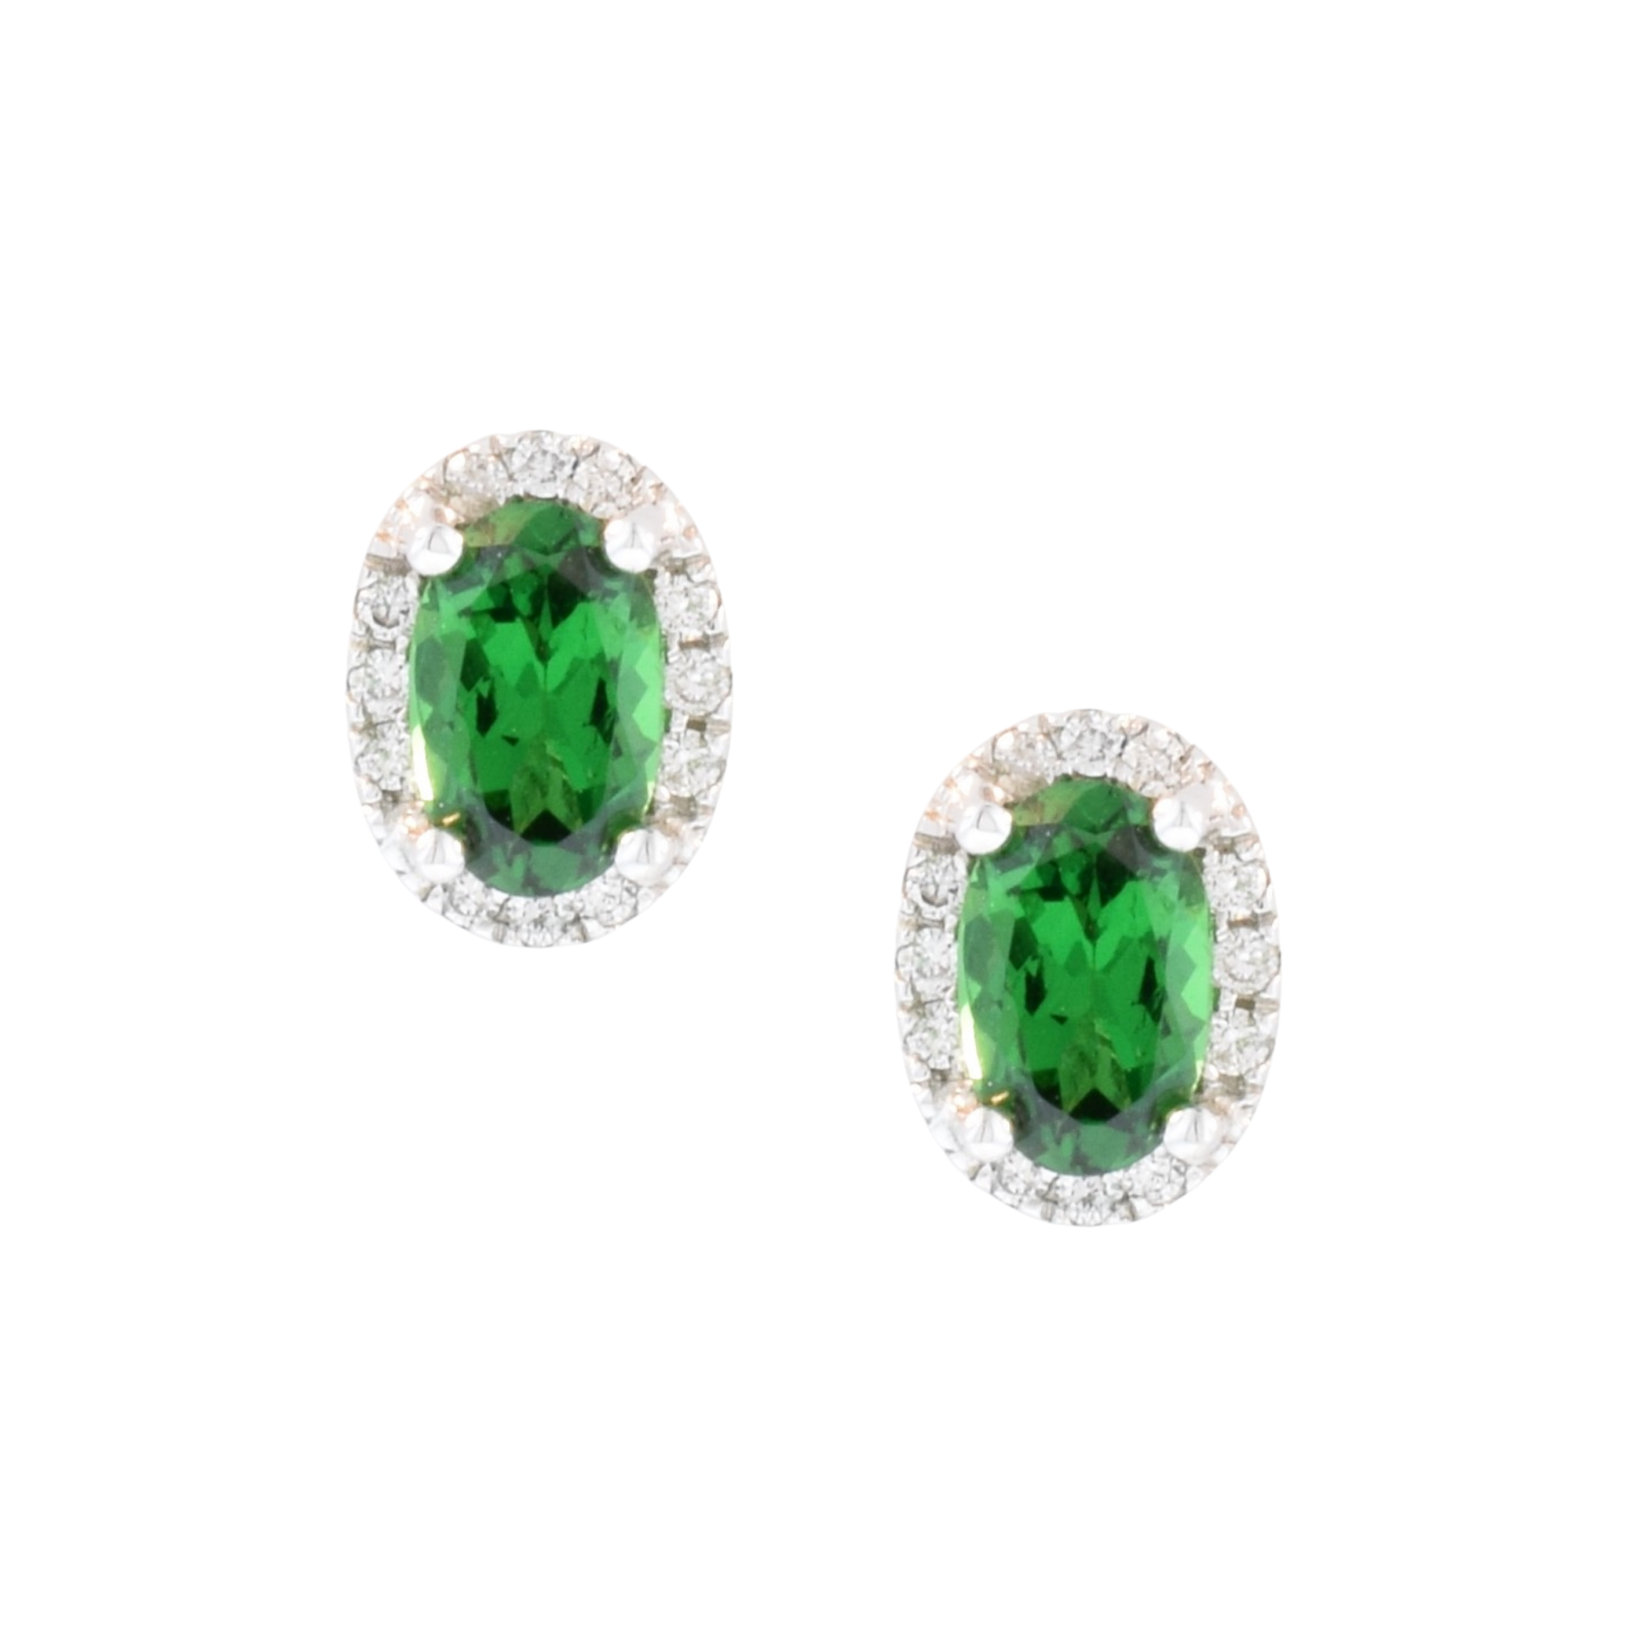 Tsavorite Garnet and Diamond Halo Stud Earrings